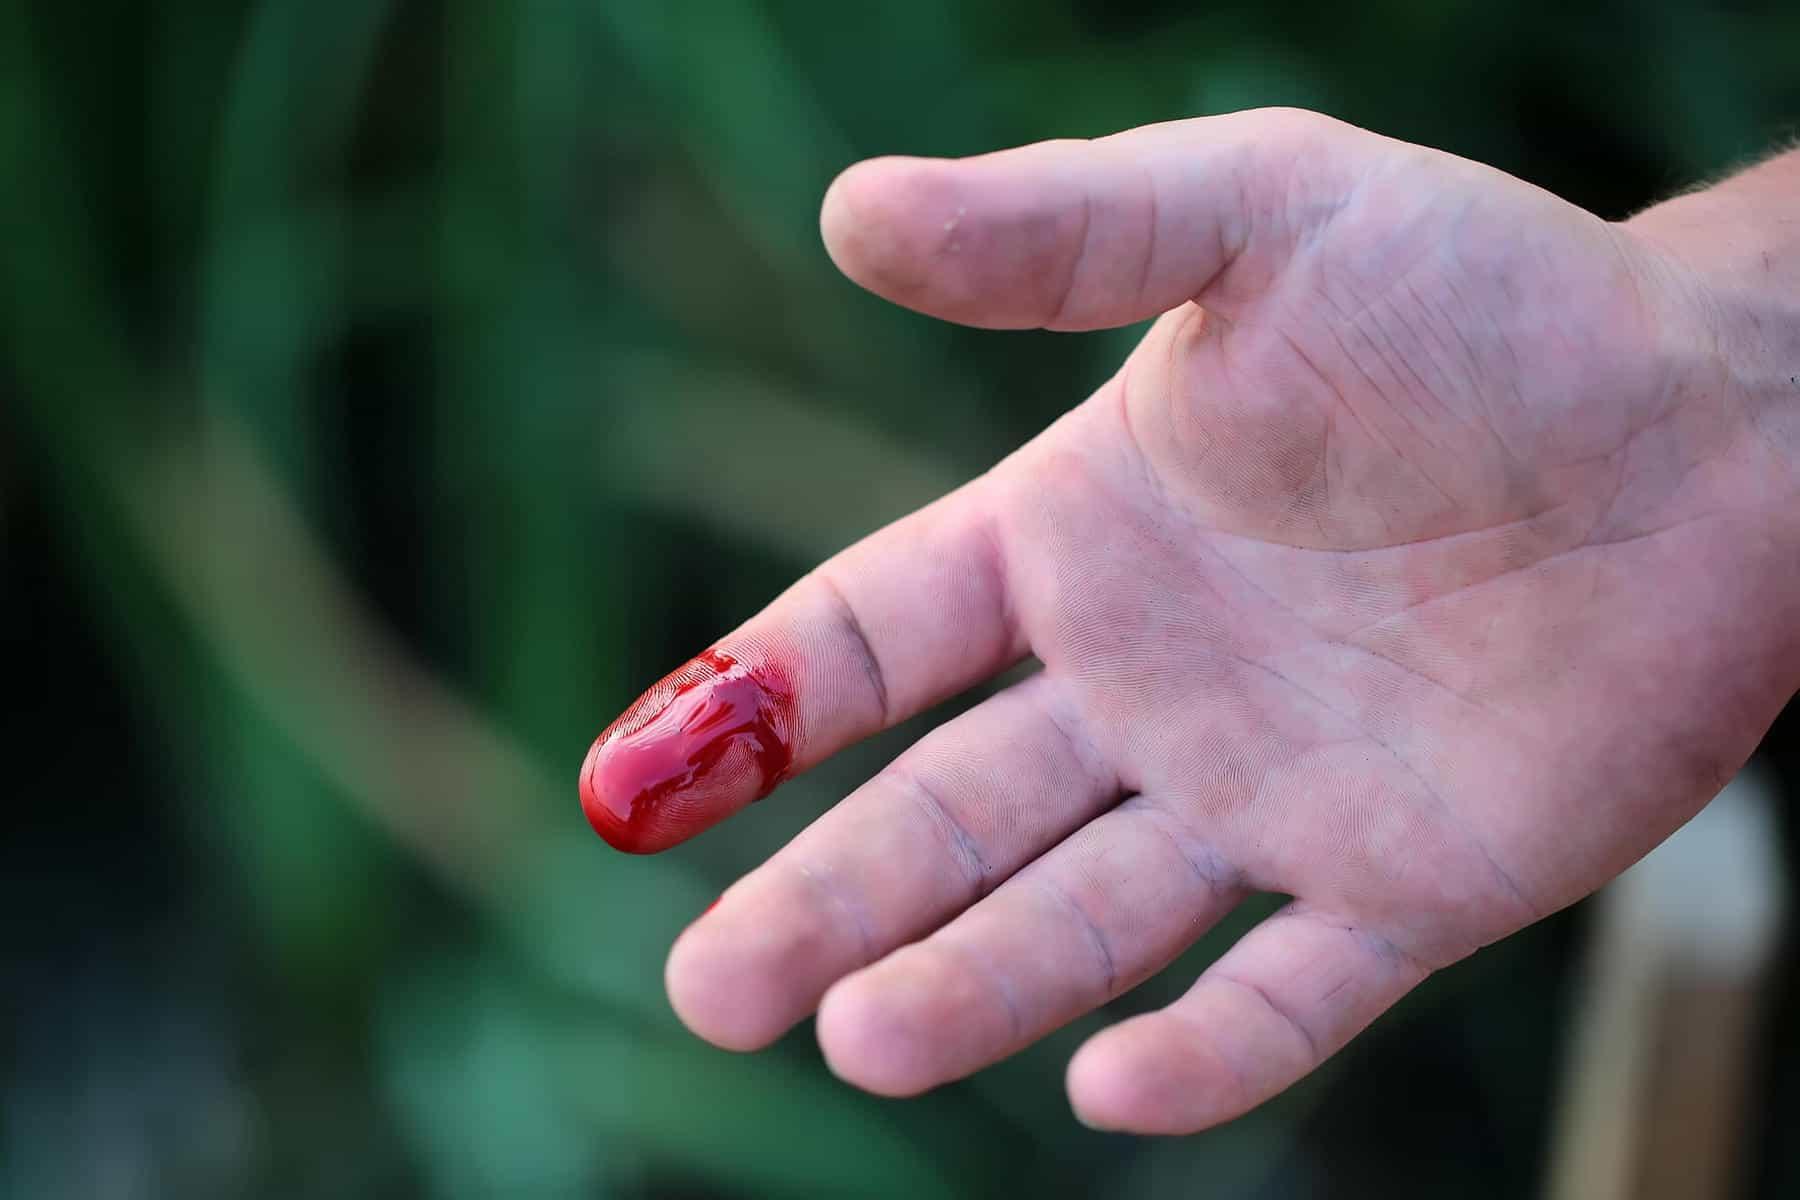 Finger cut